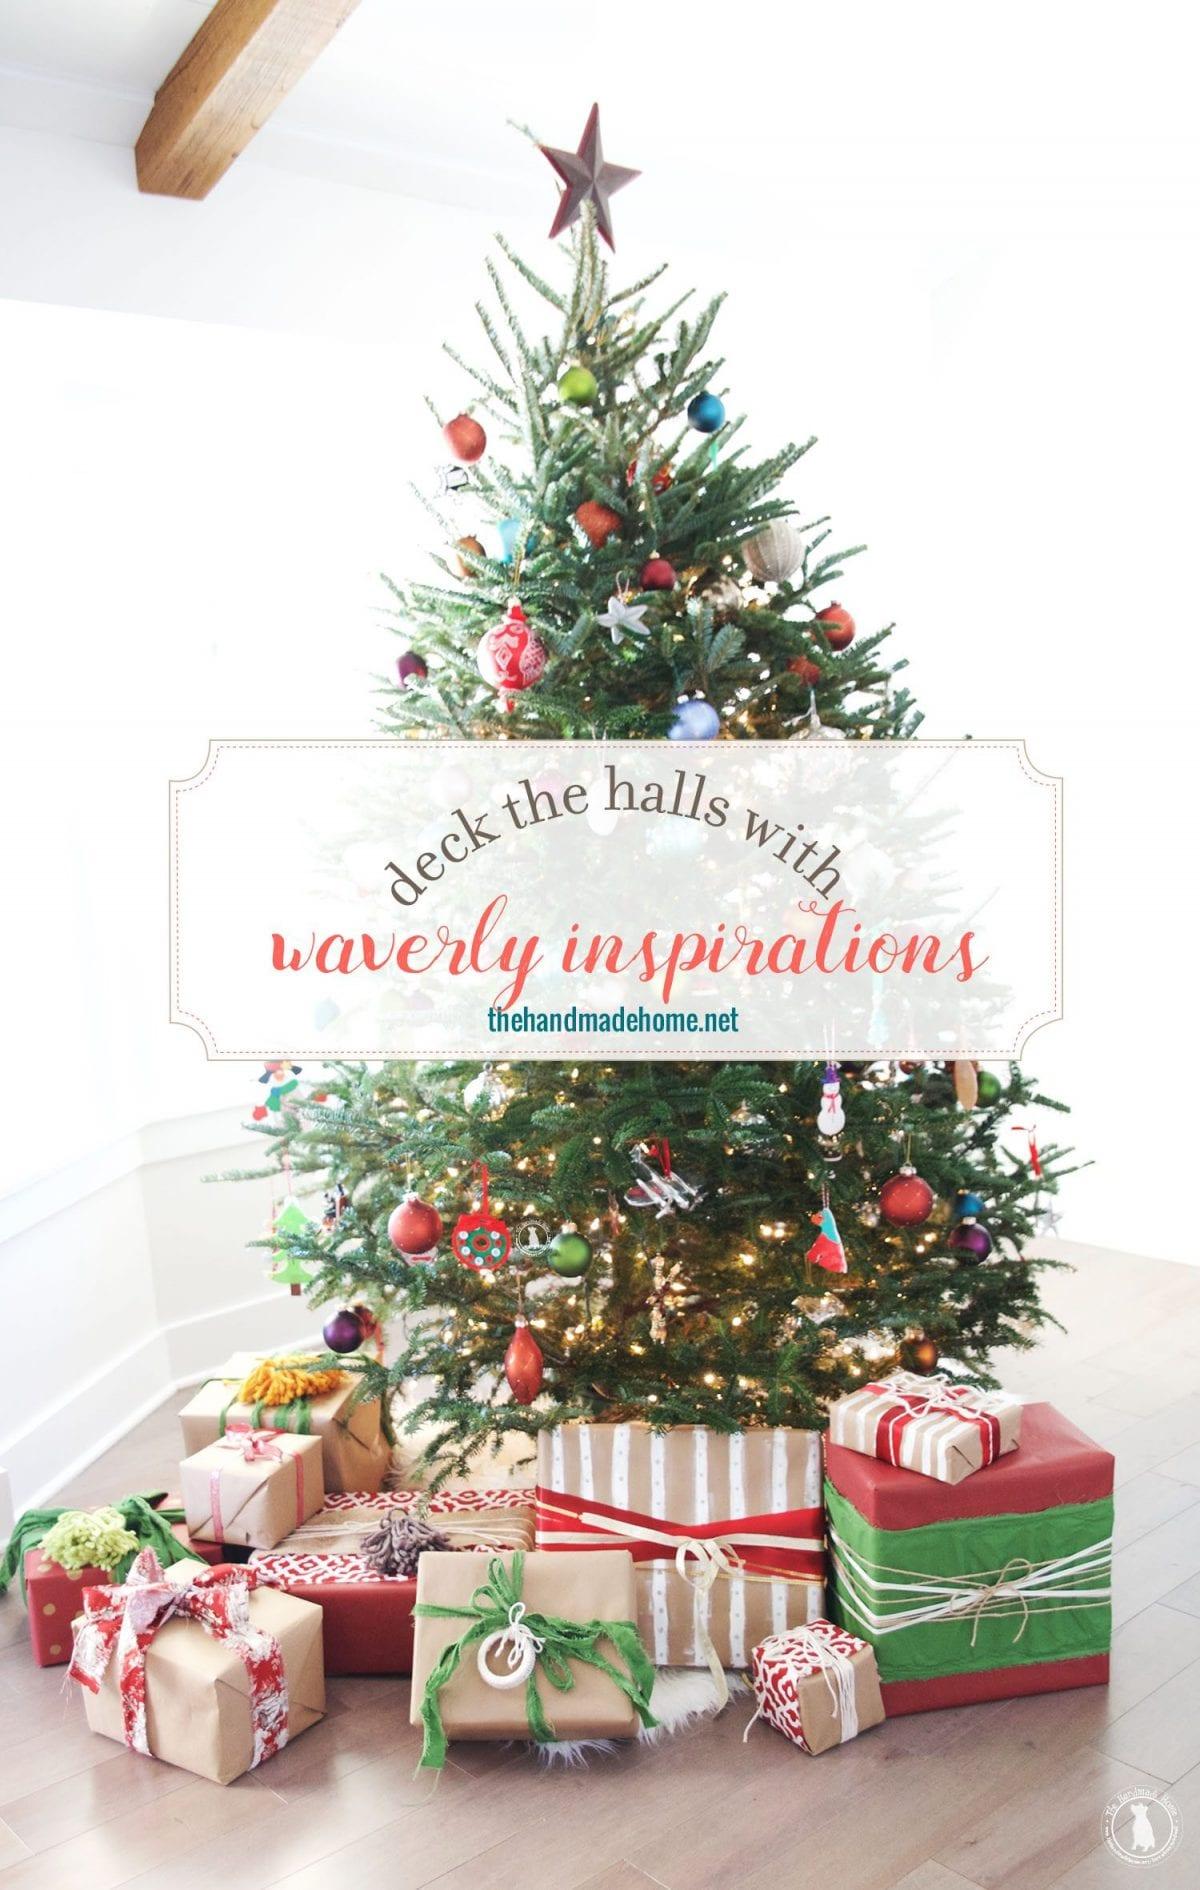 deck_the_halls-waverly_inspirations